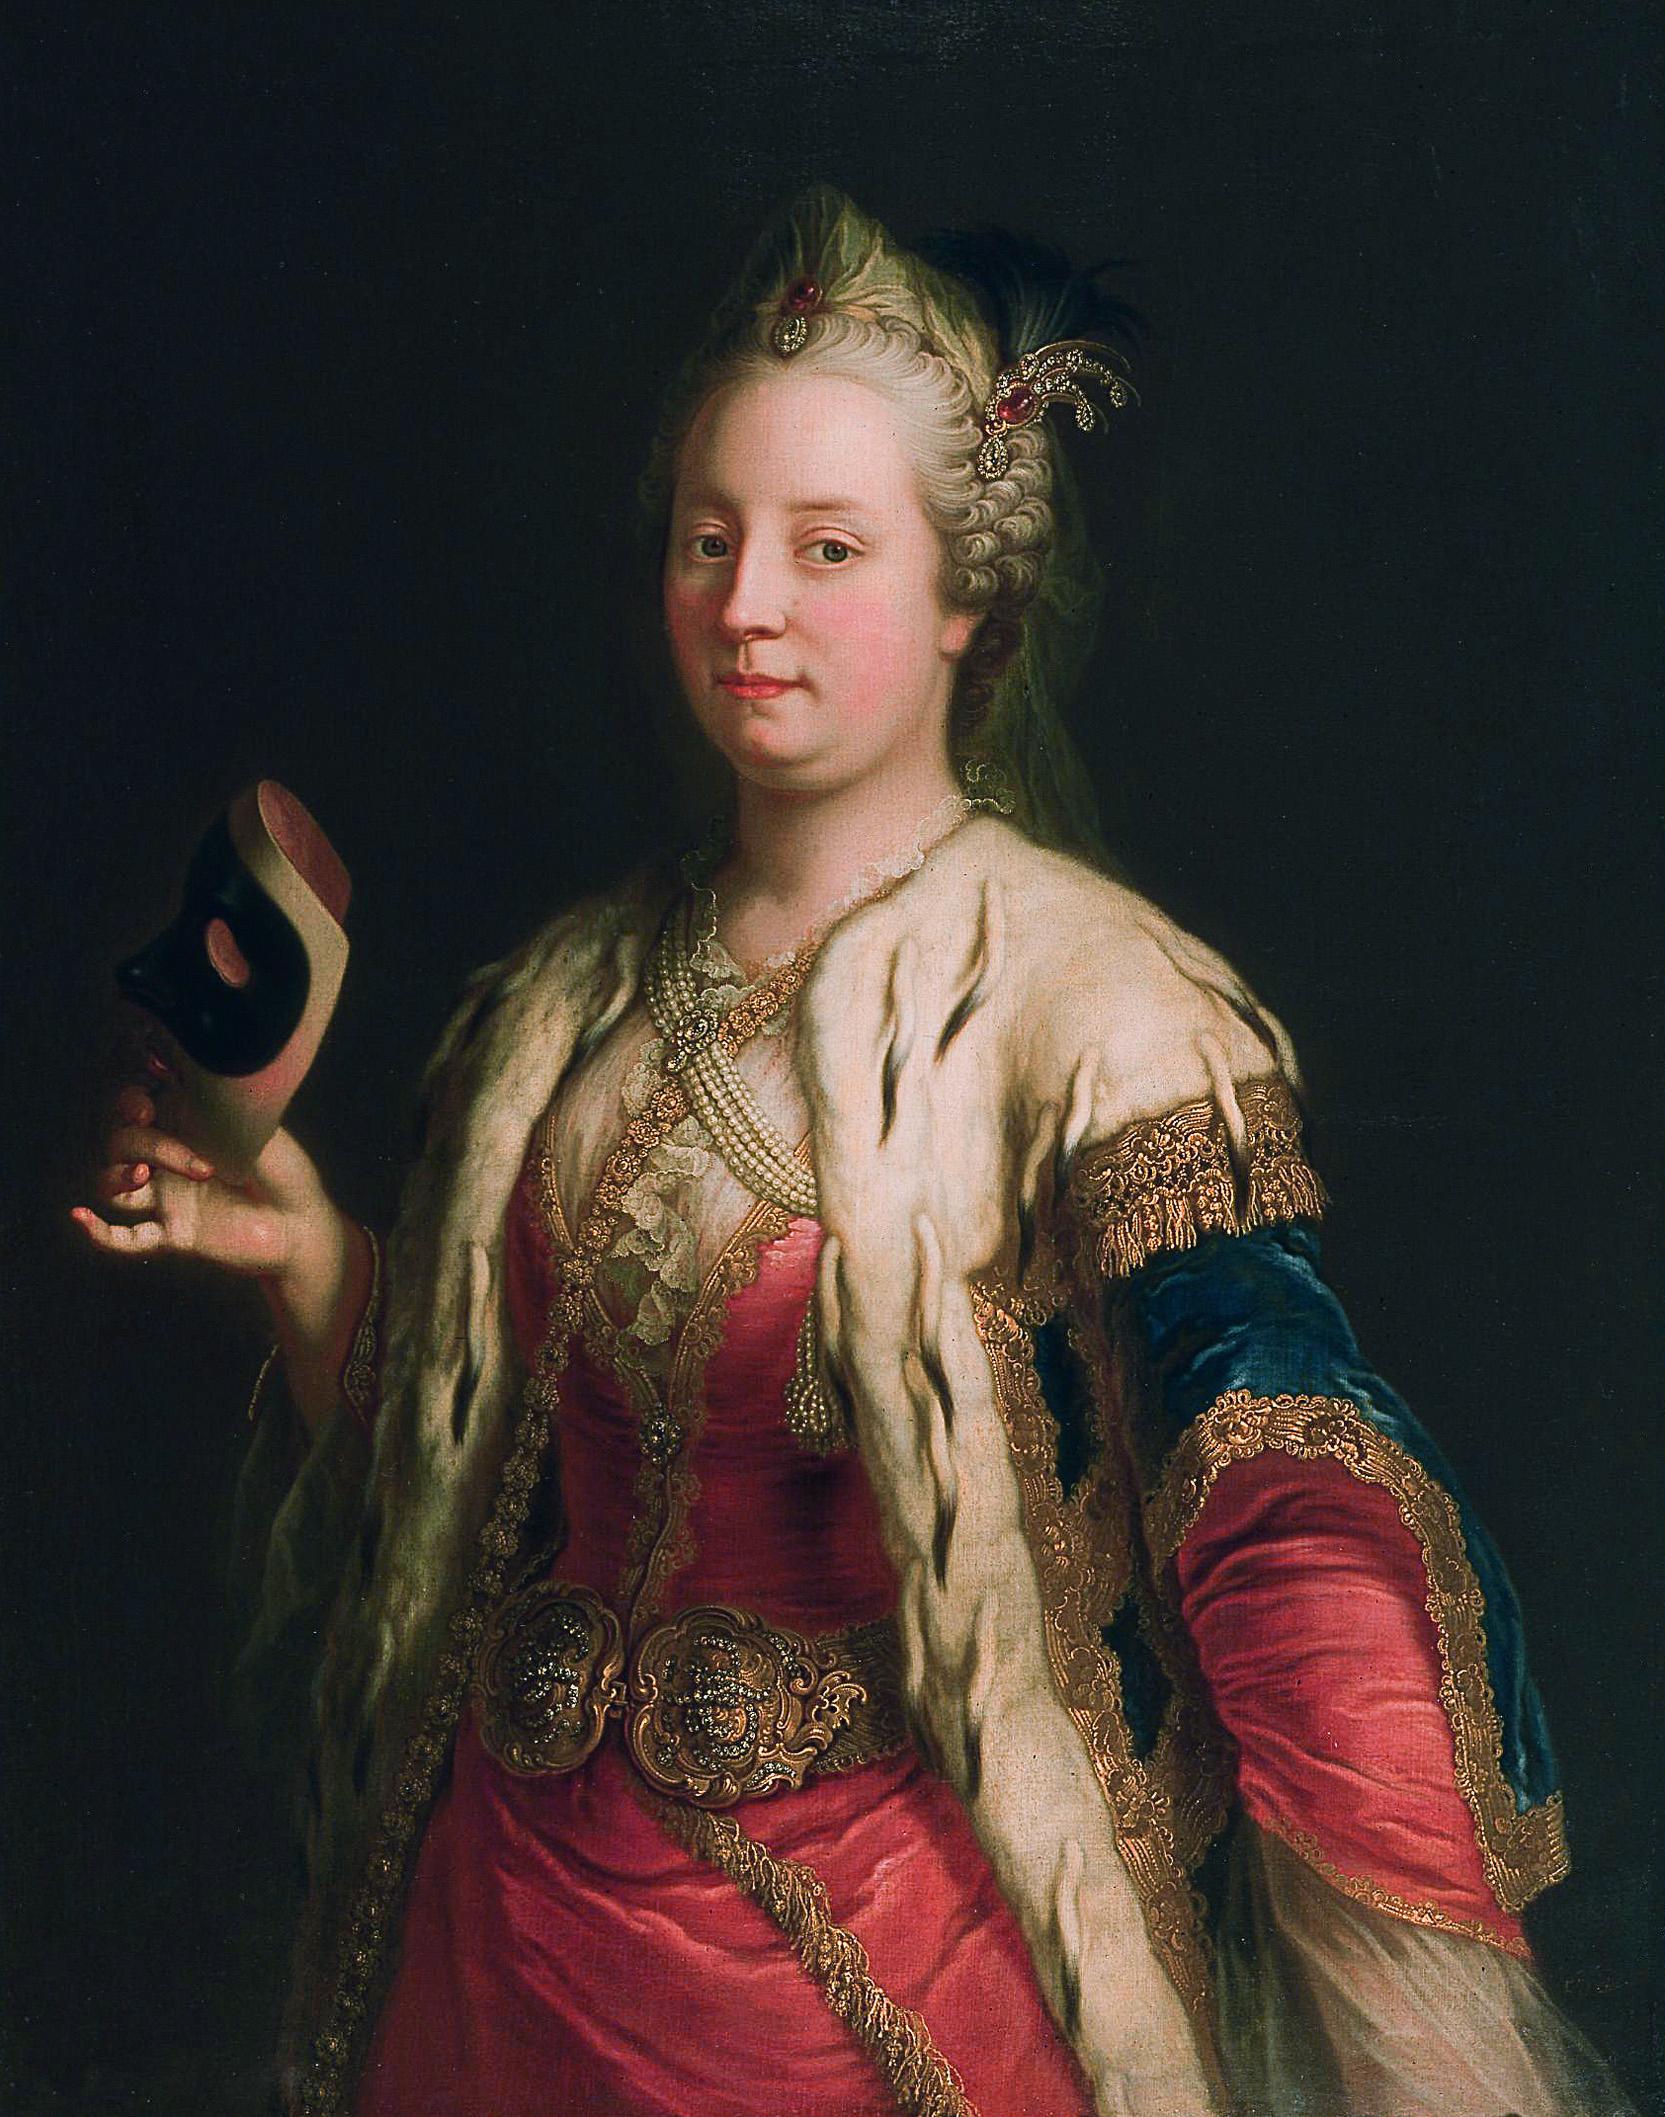 Marie-Therese d'Autriche, par Martin van Meytens